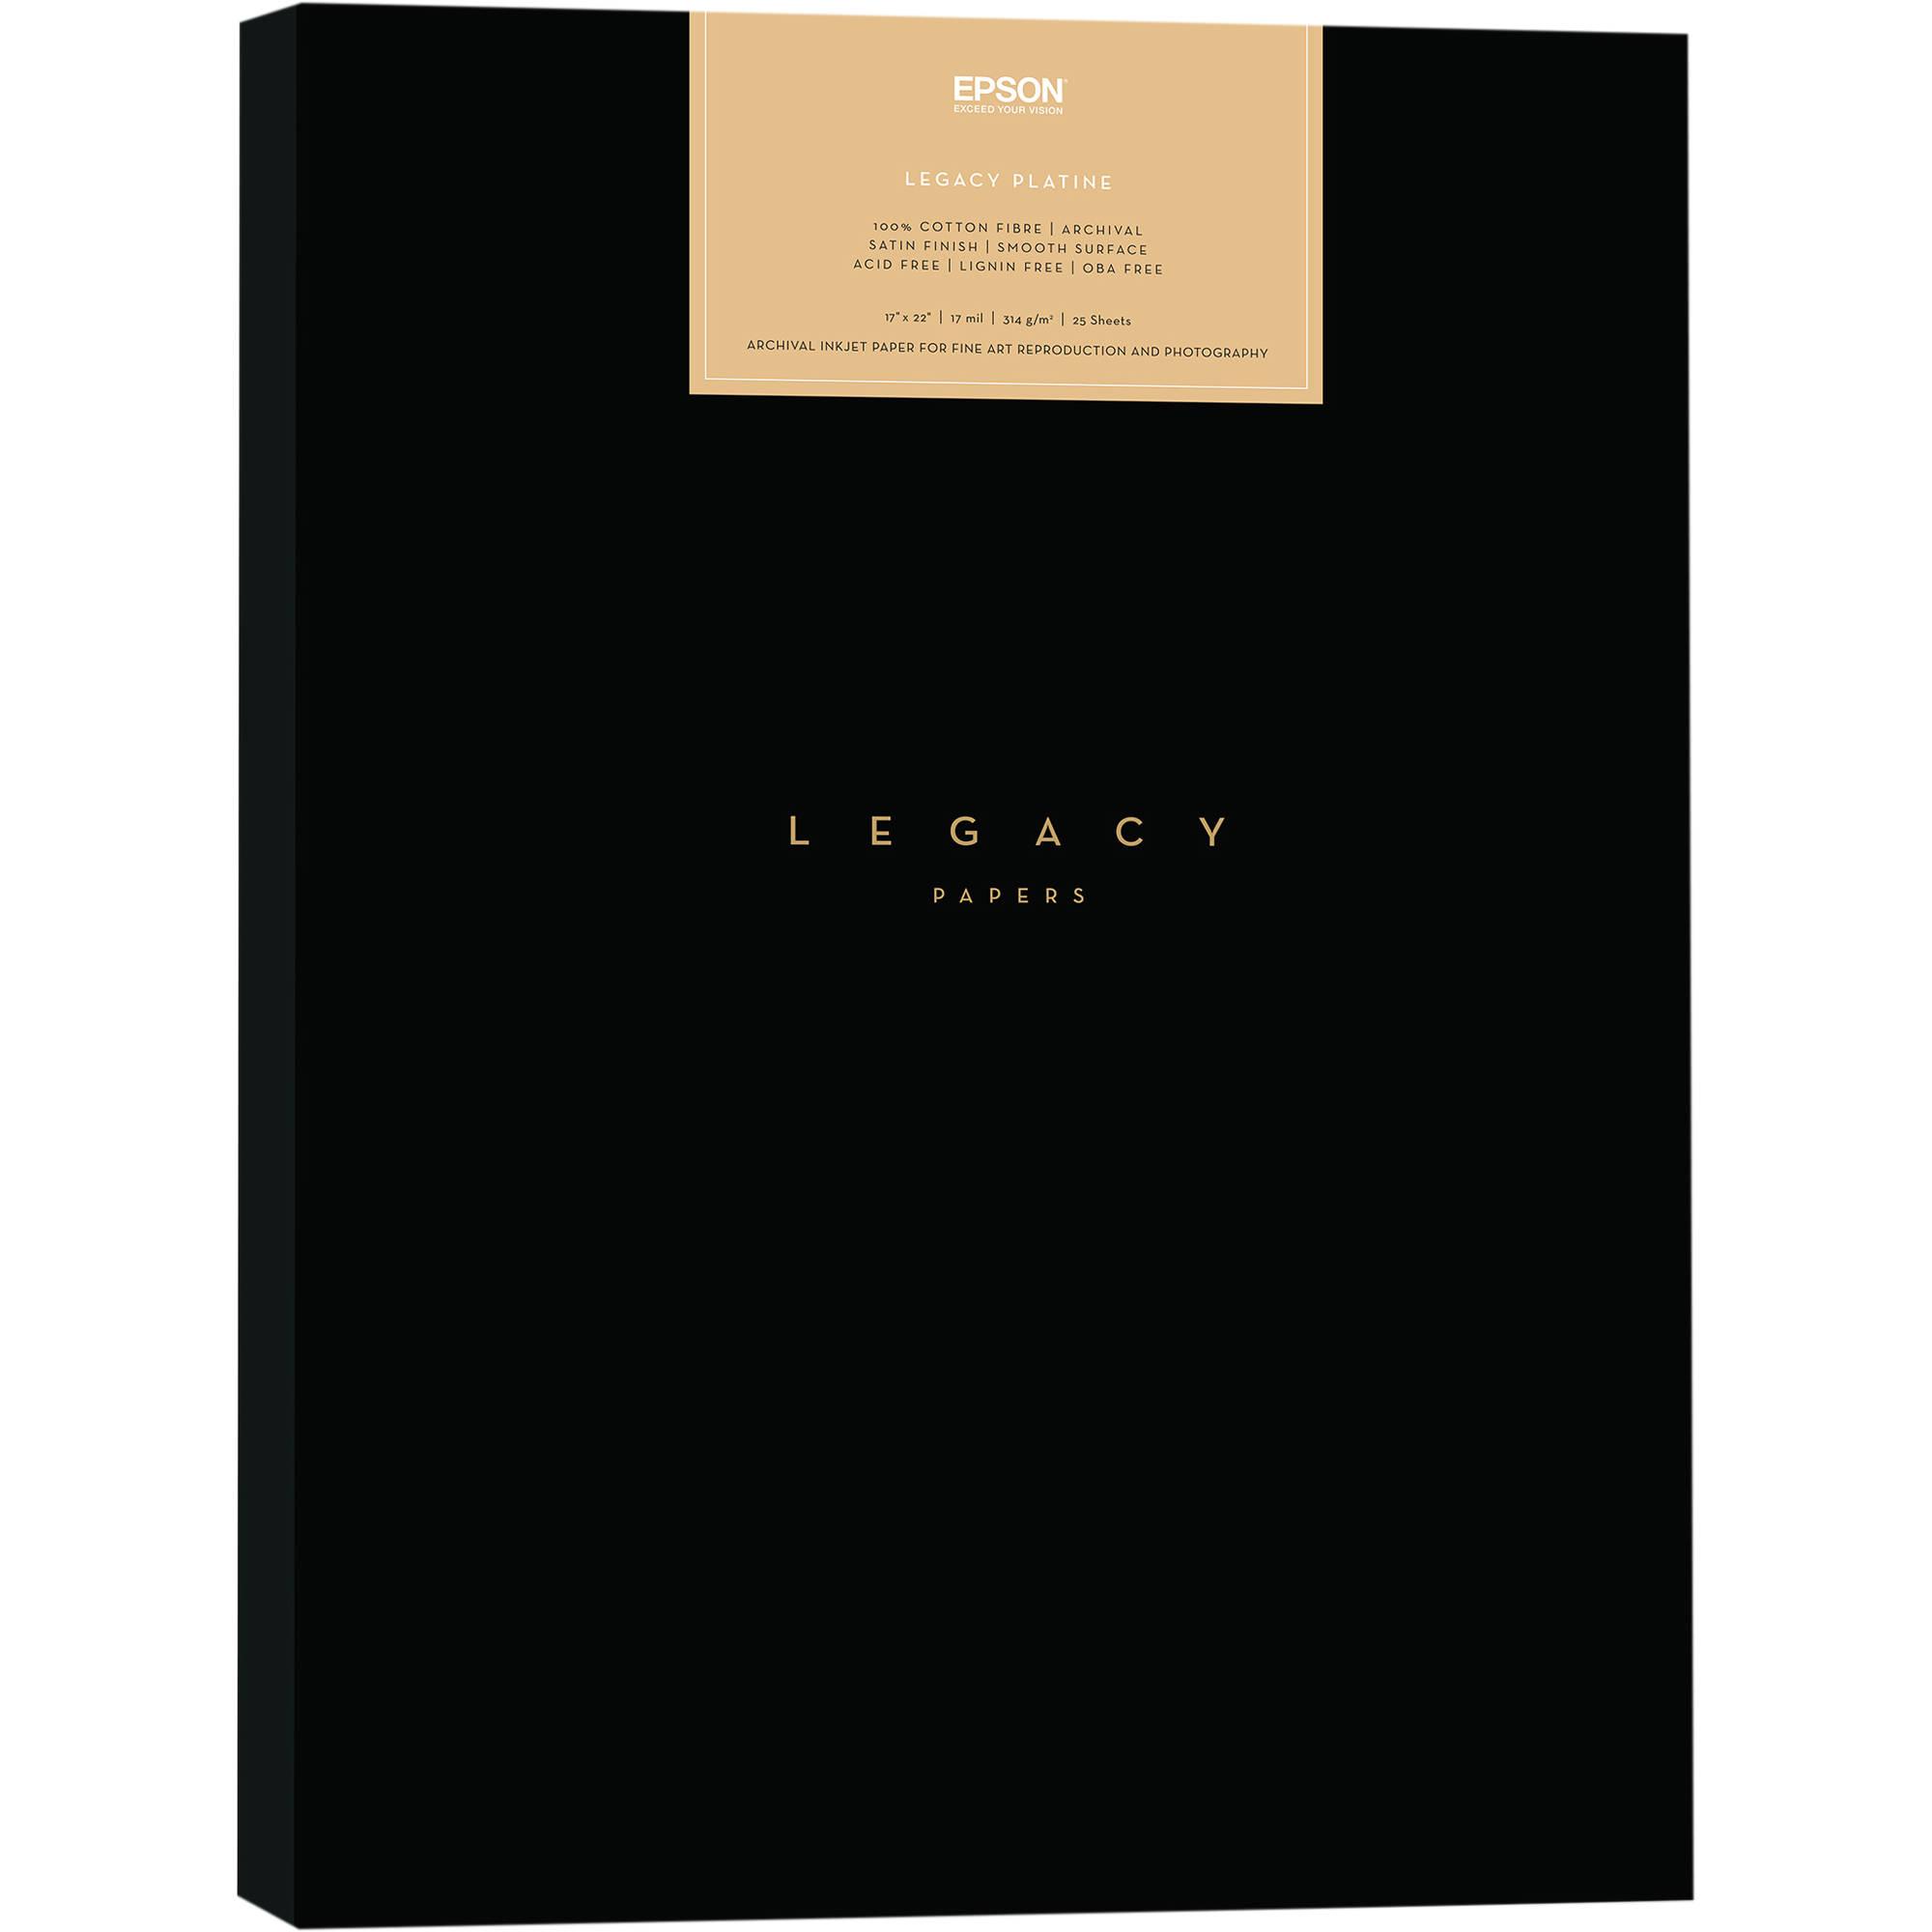 Epson Legacy Platine Paper (17 x 22\